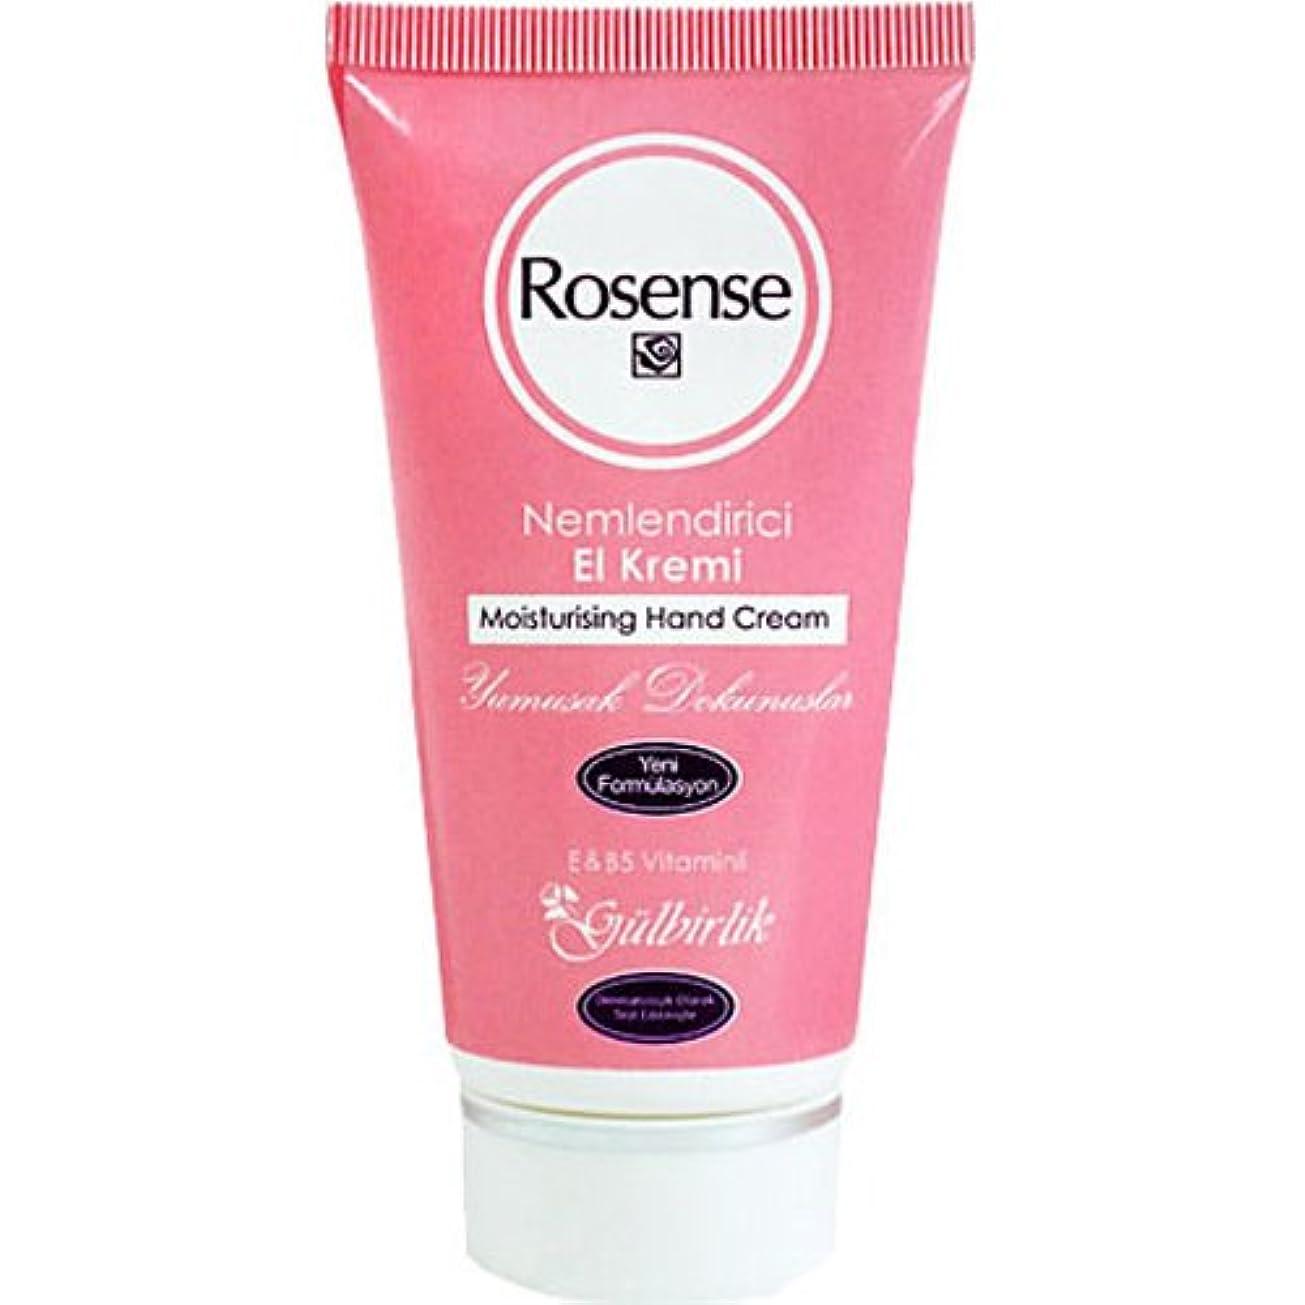 ROSENSE ハンドクリーム 75ml